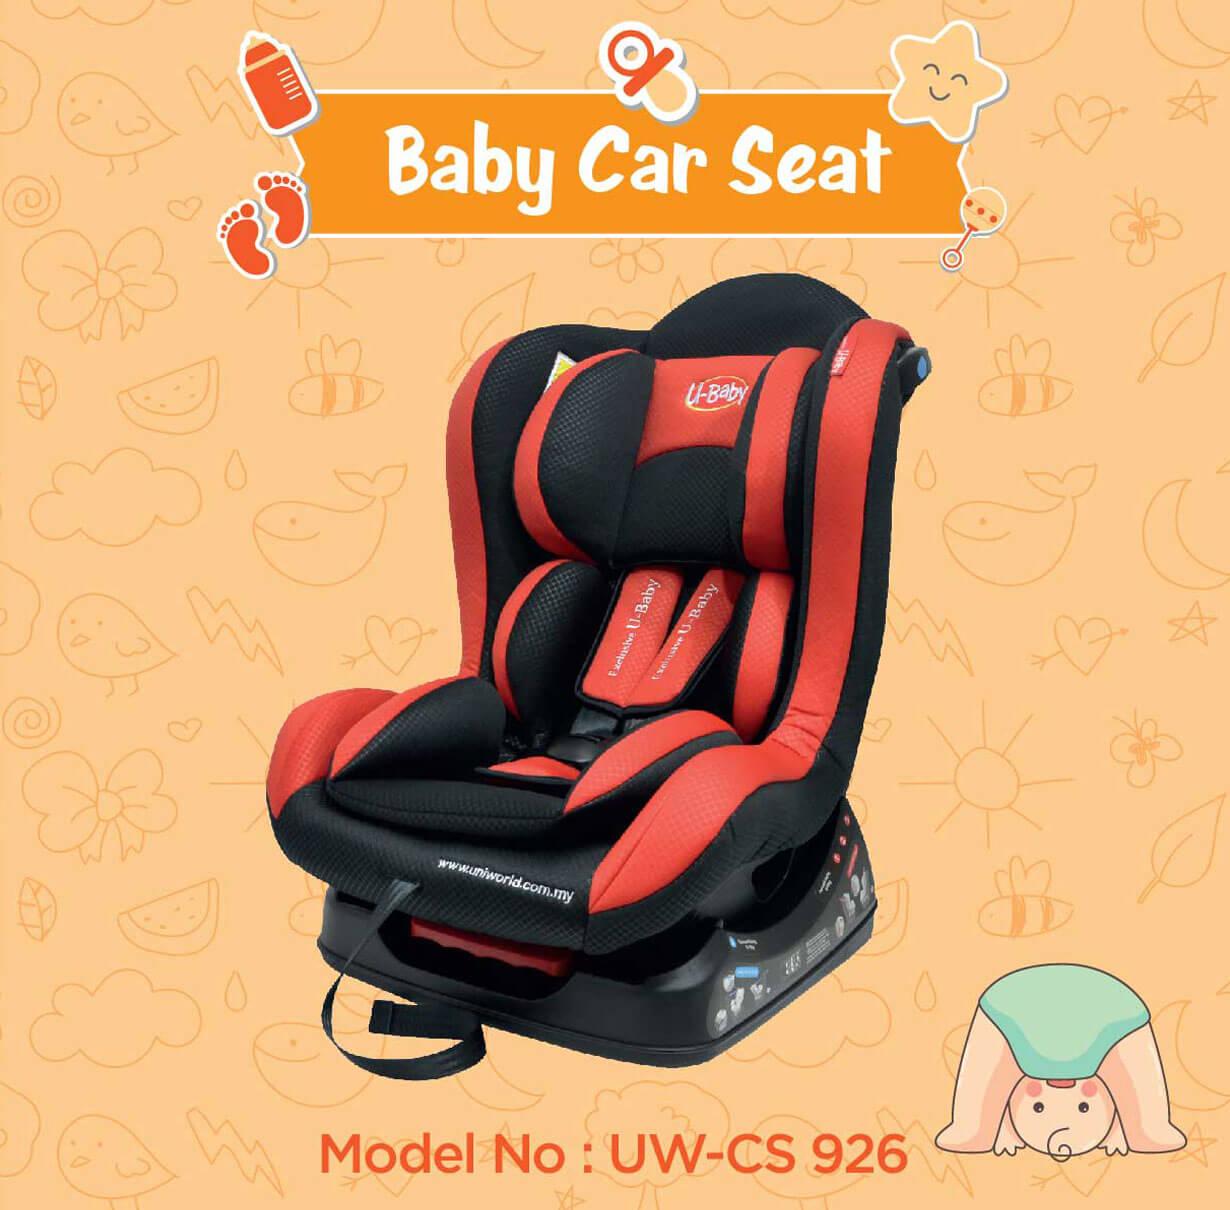 uniword-baby-image-04